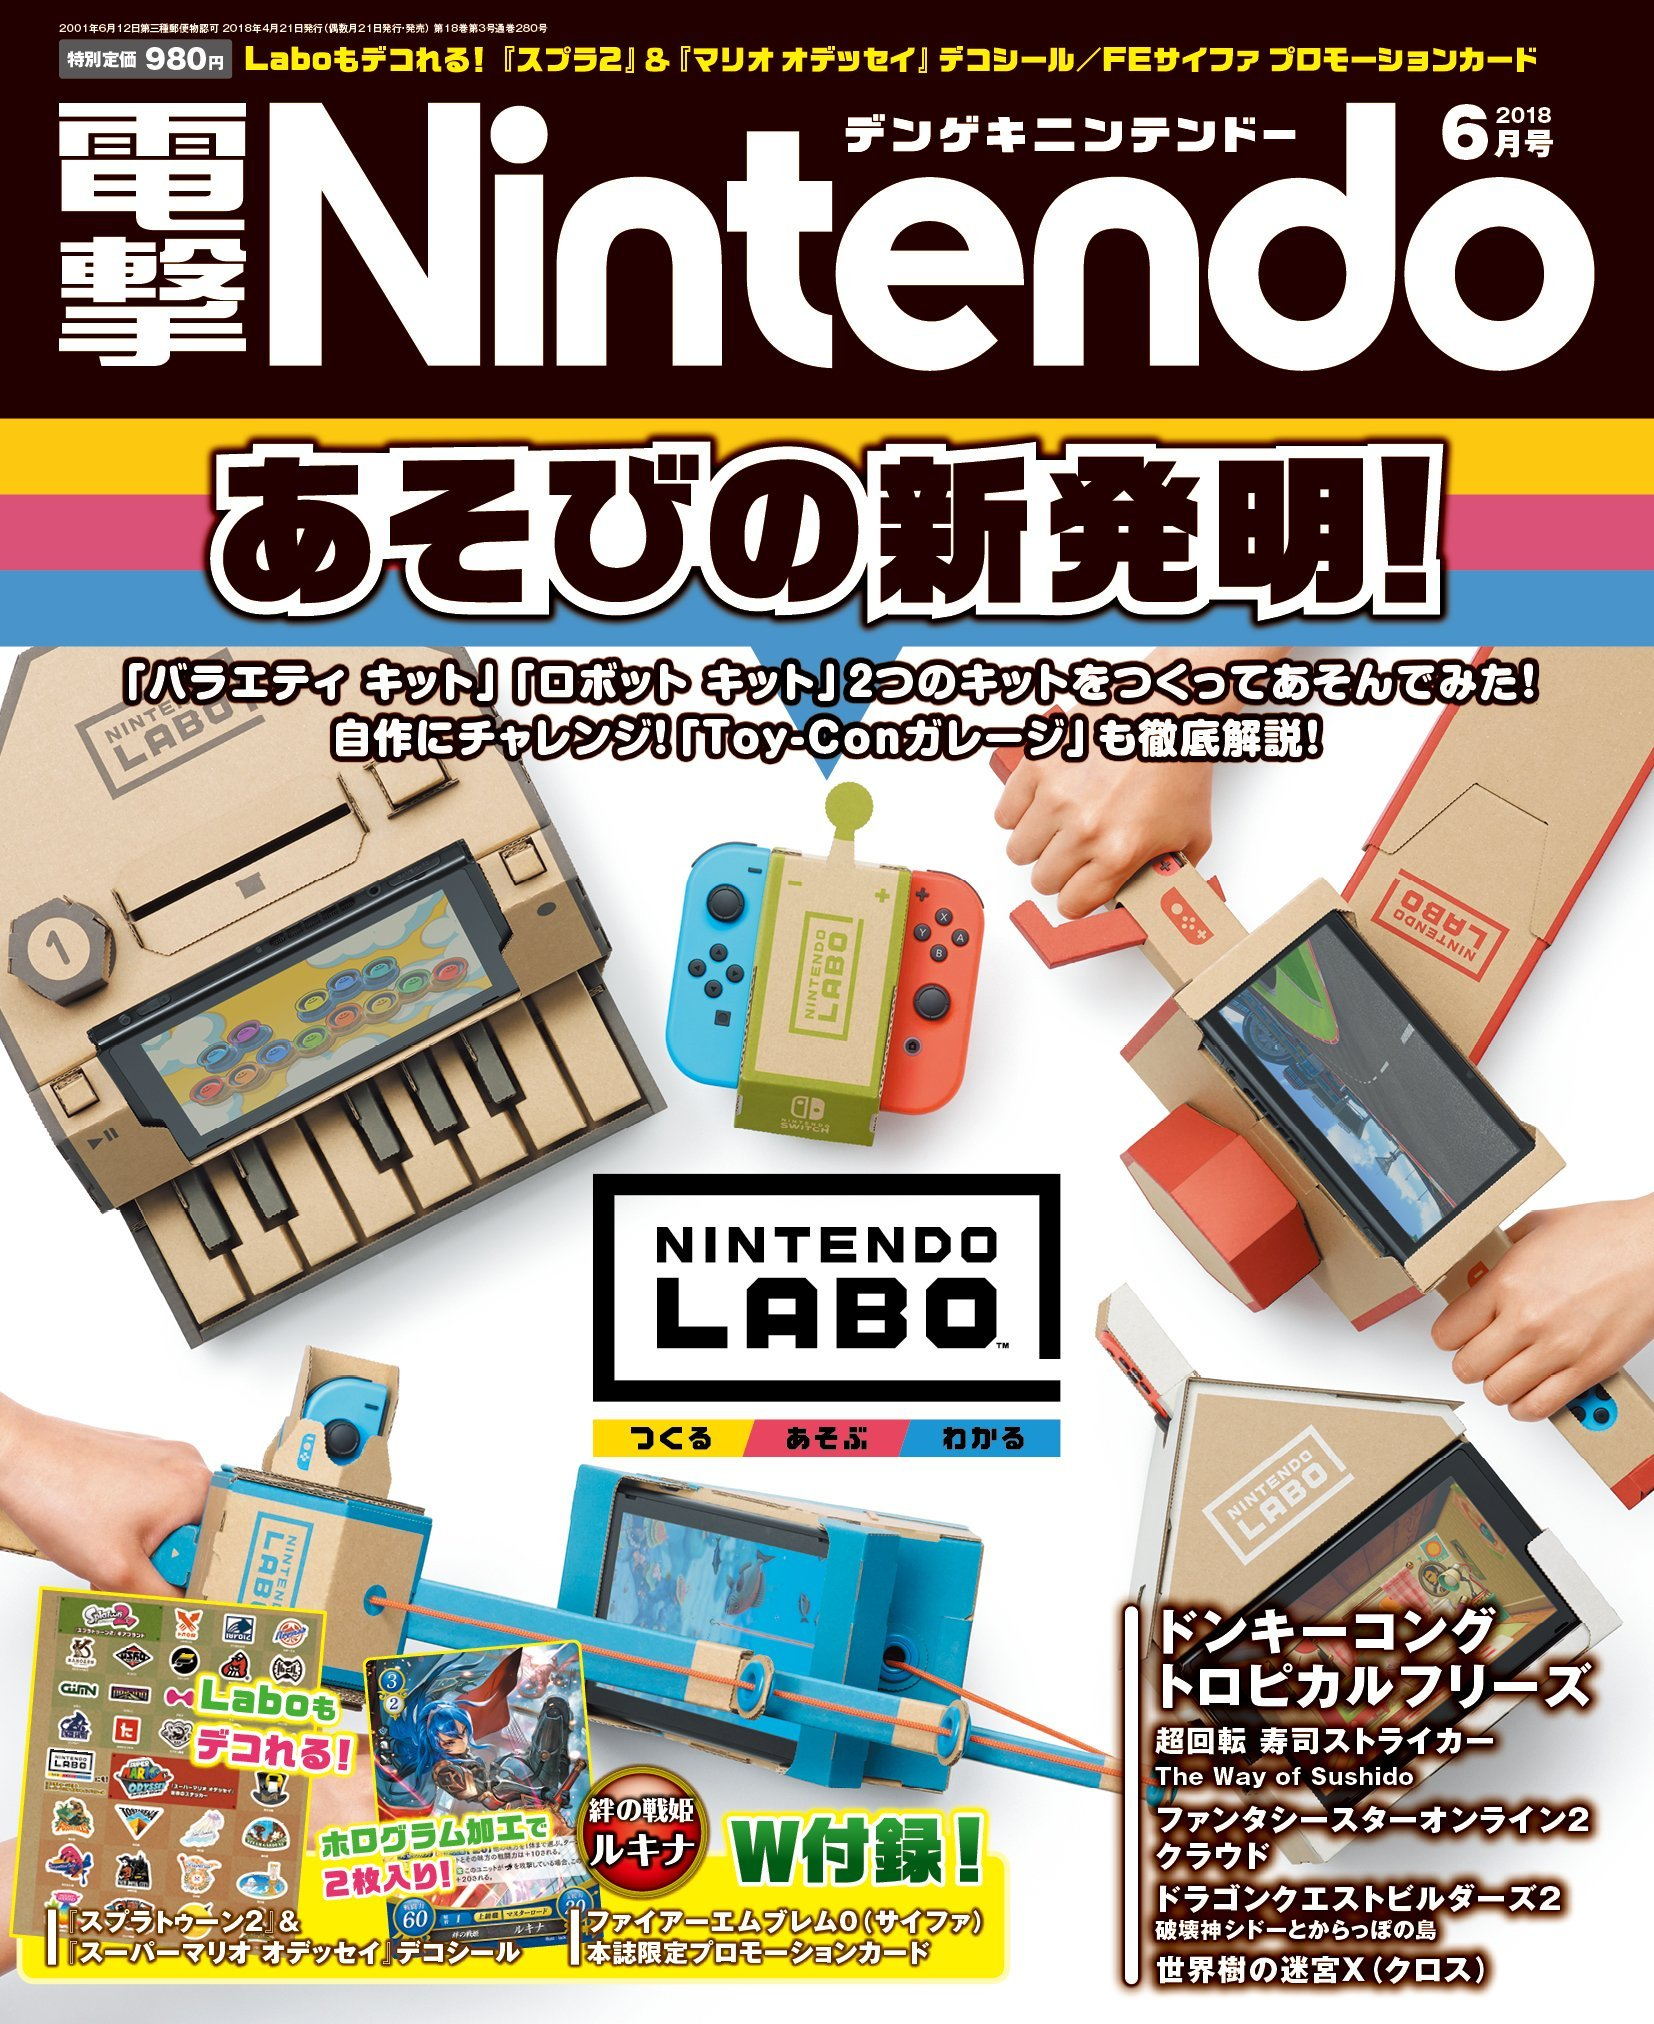 Dengeki Nintendo Issue 054 (June 2018)